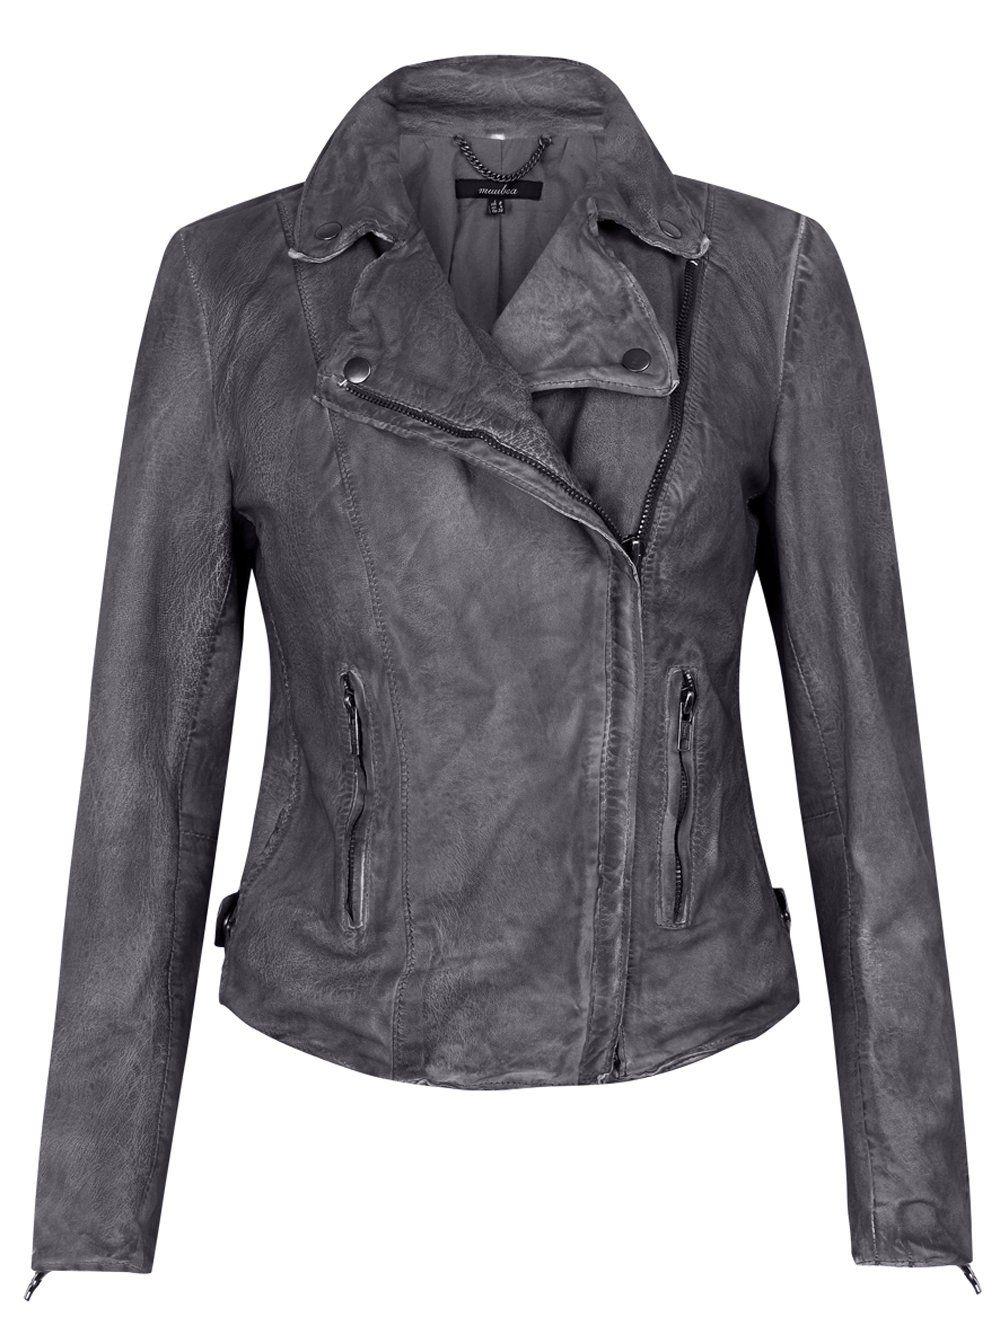 Monteria Leather Biker Jacket In Charcoal Grey Designer Leather Jackets Muubaa Leather Jacket Grey Leather Jacket [ 1334 x 1000 Pixel ]